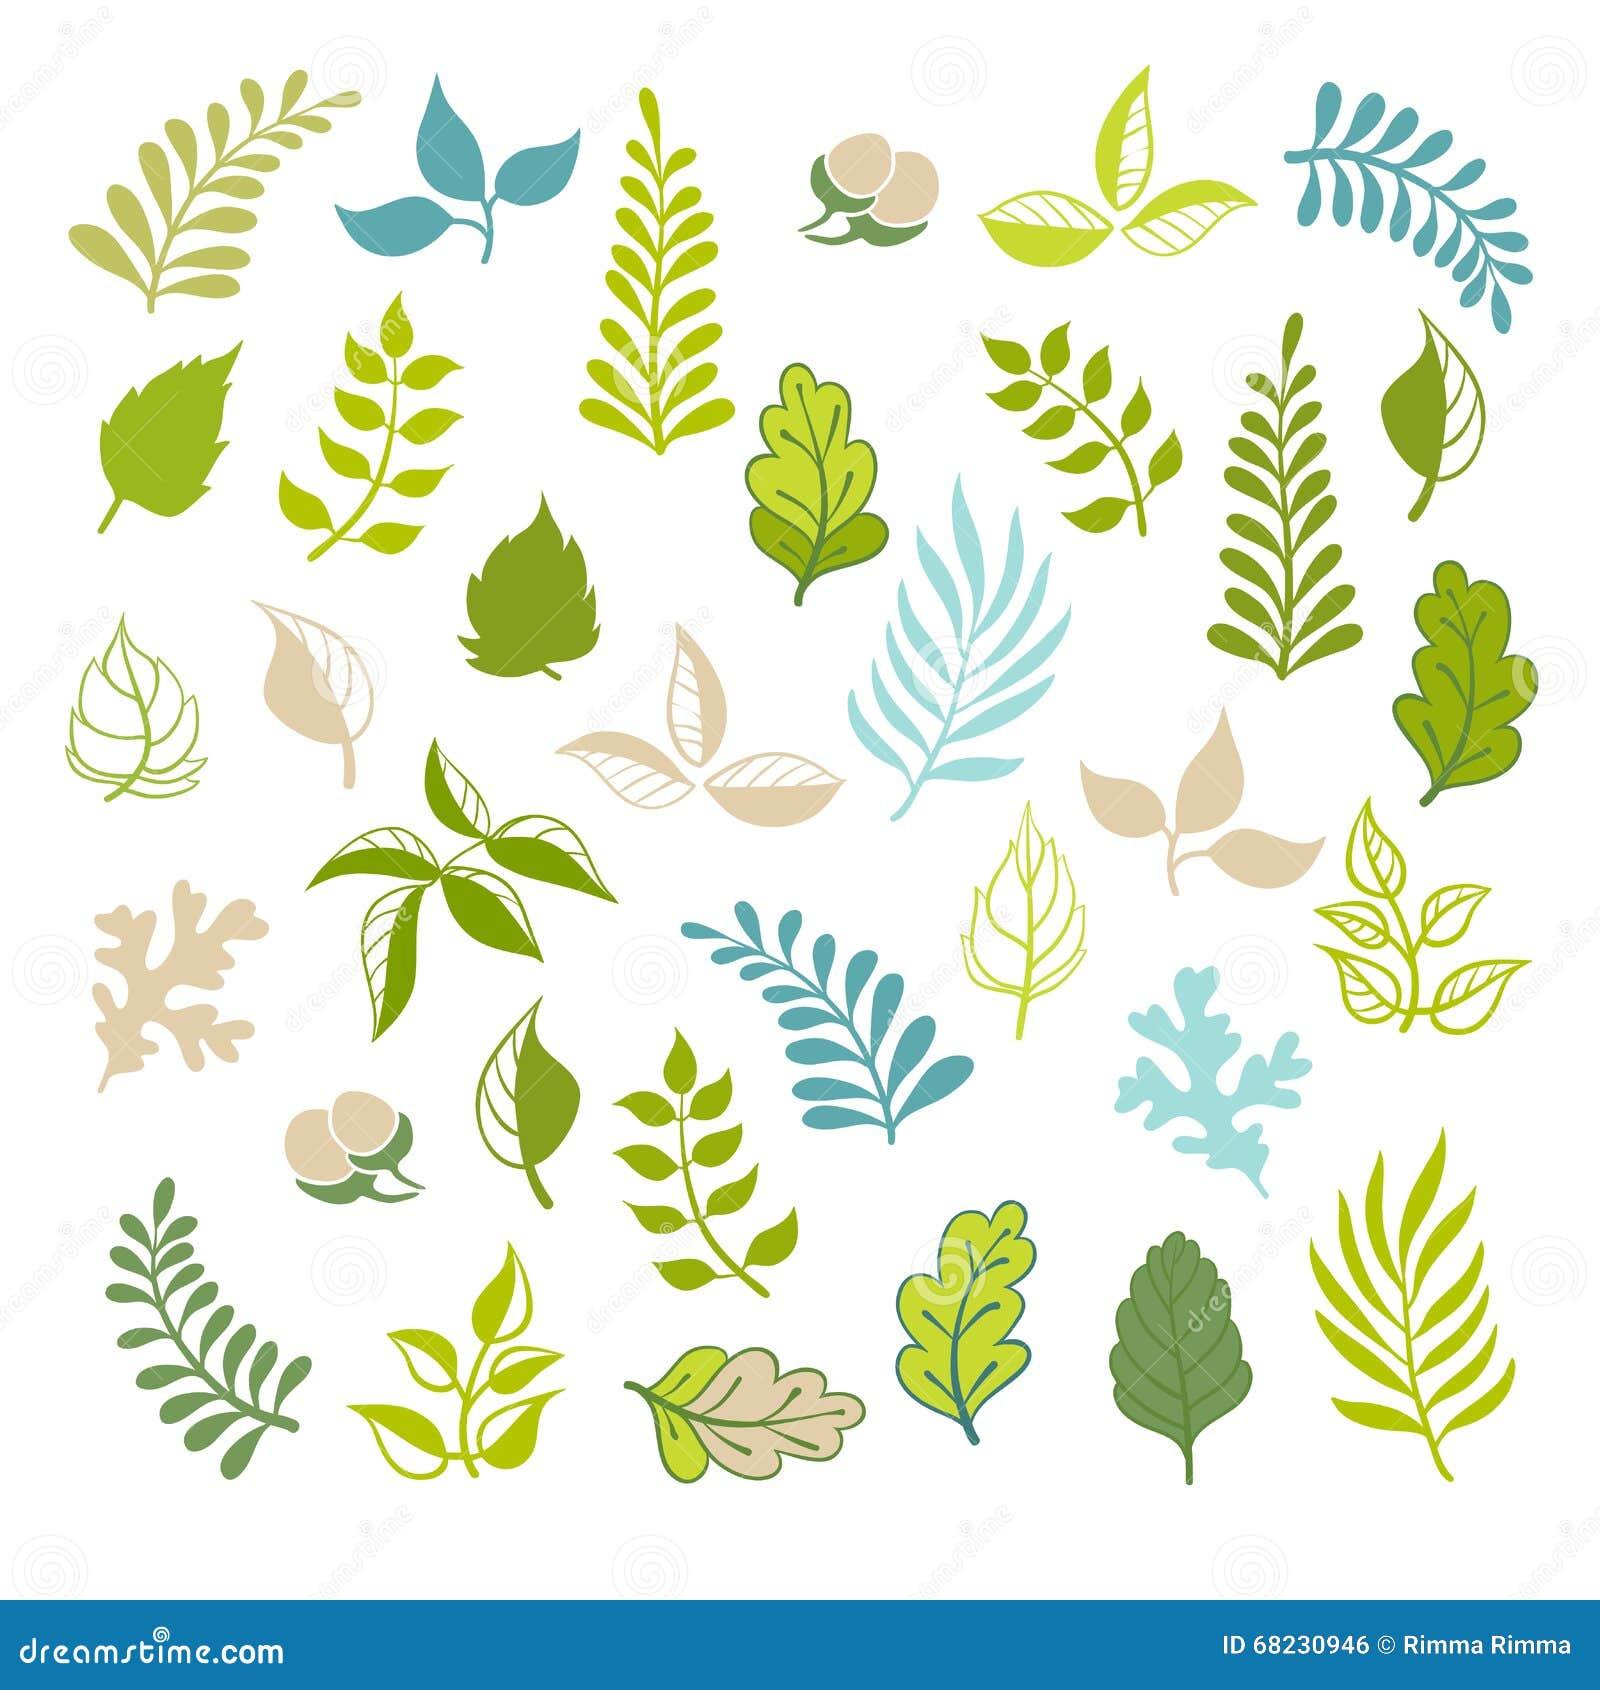 Leaves Vector Set Botanical Garden Elements On White Background